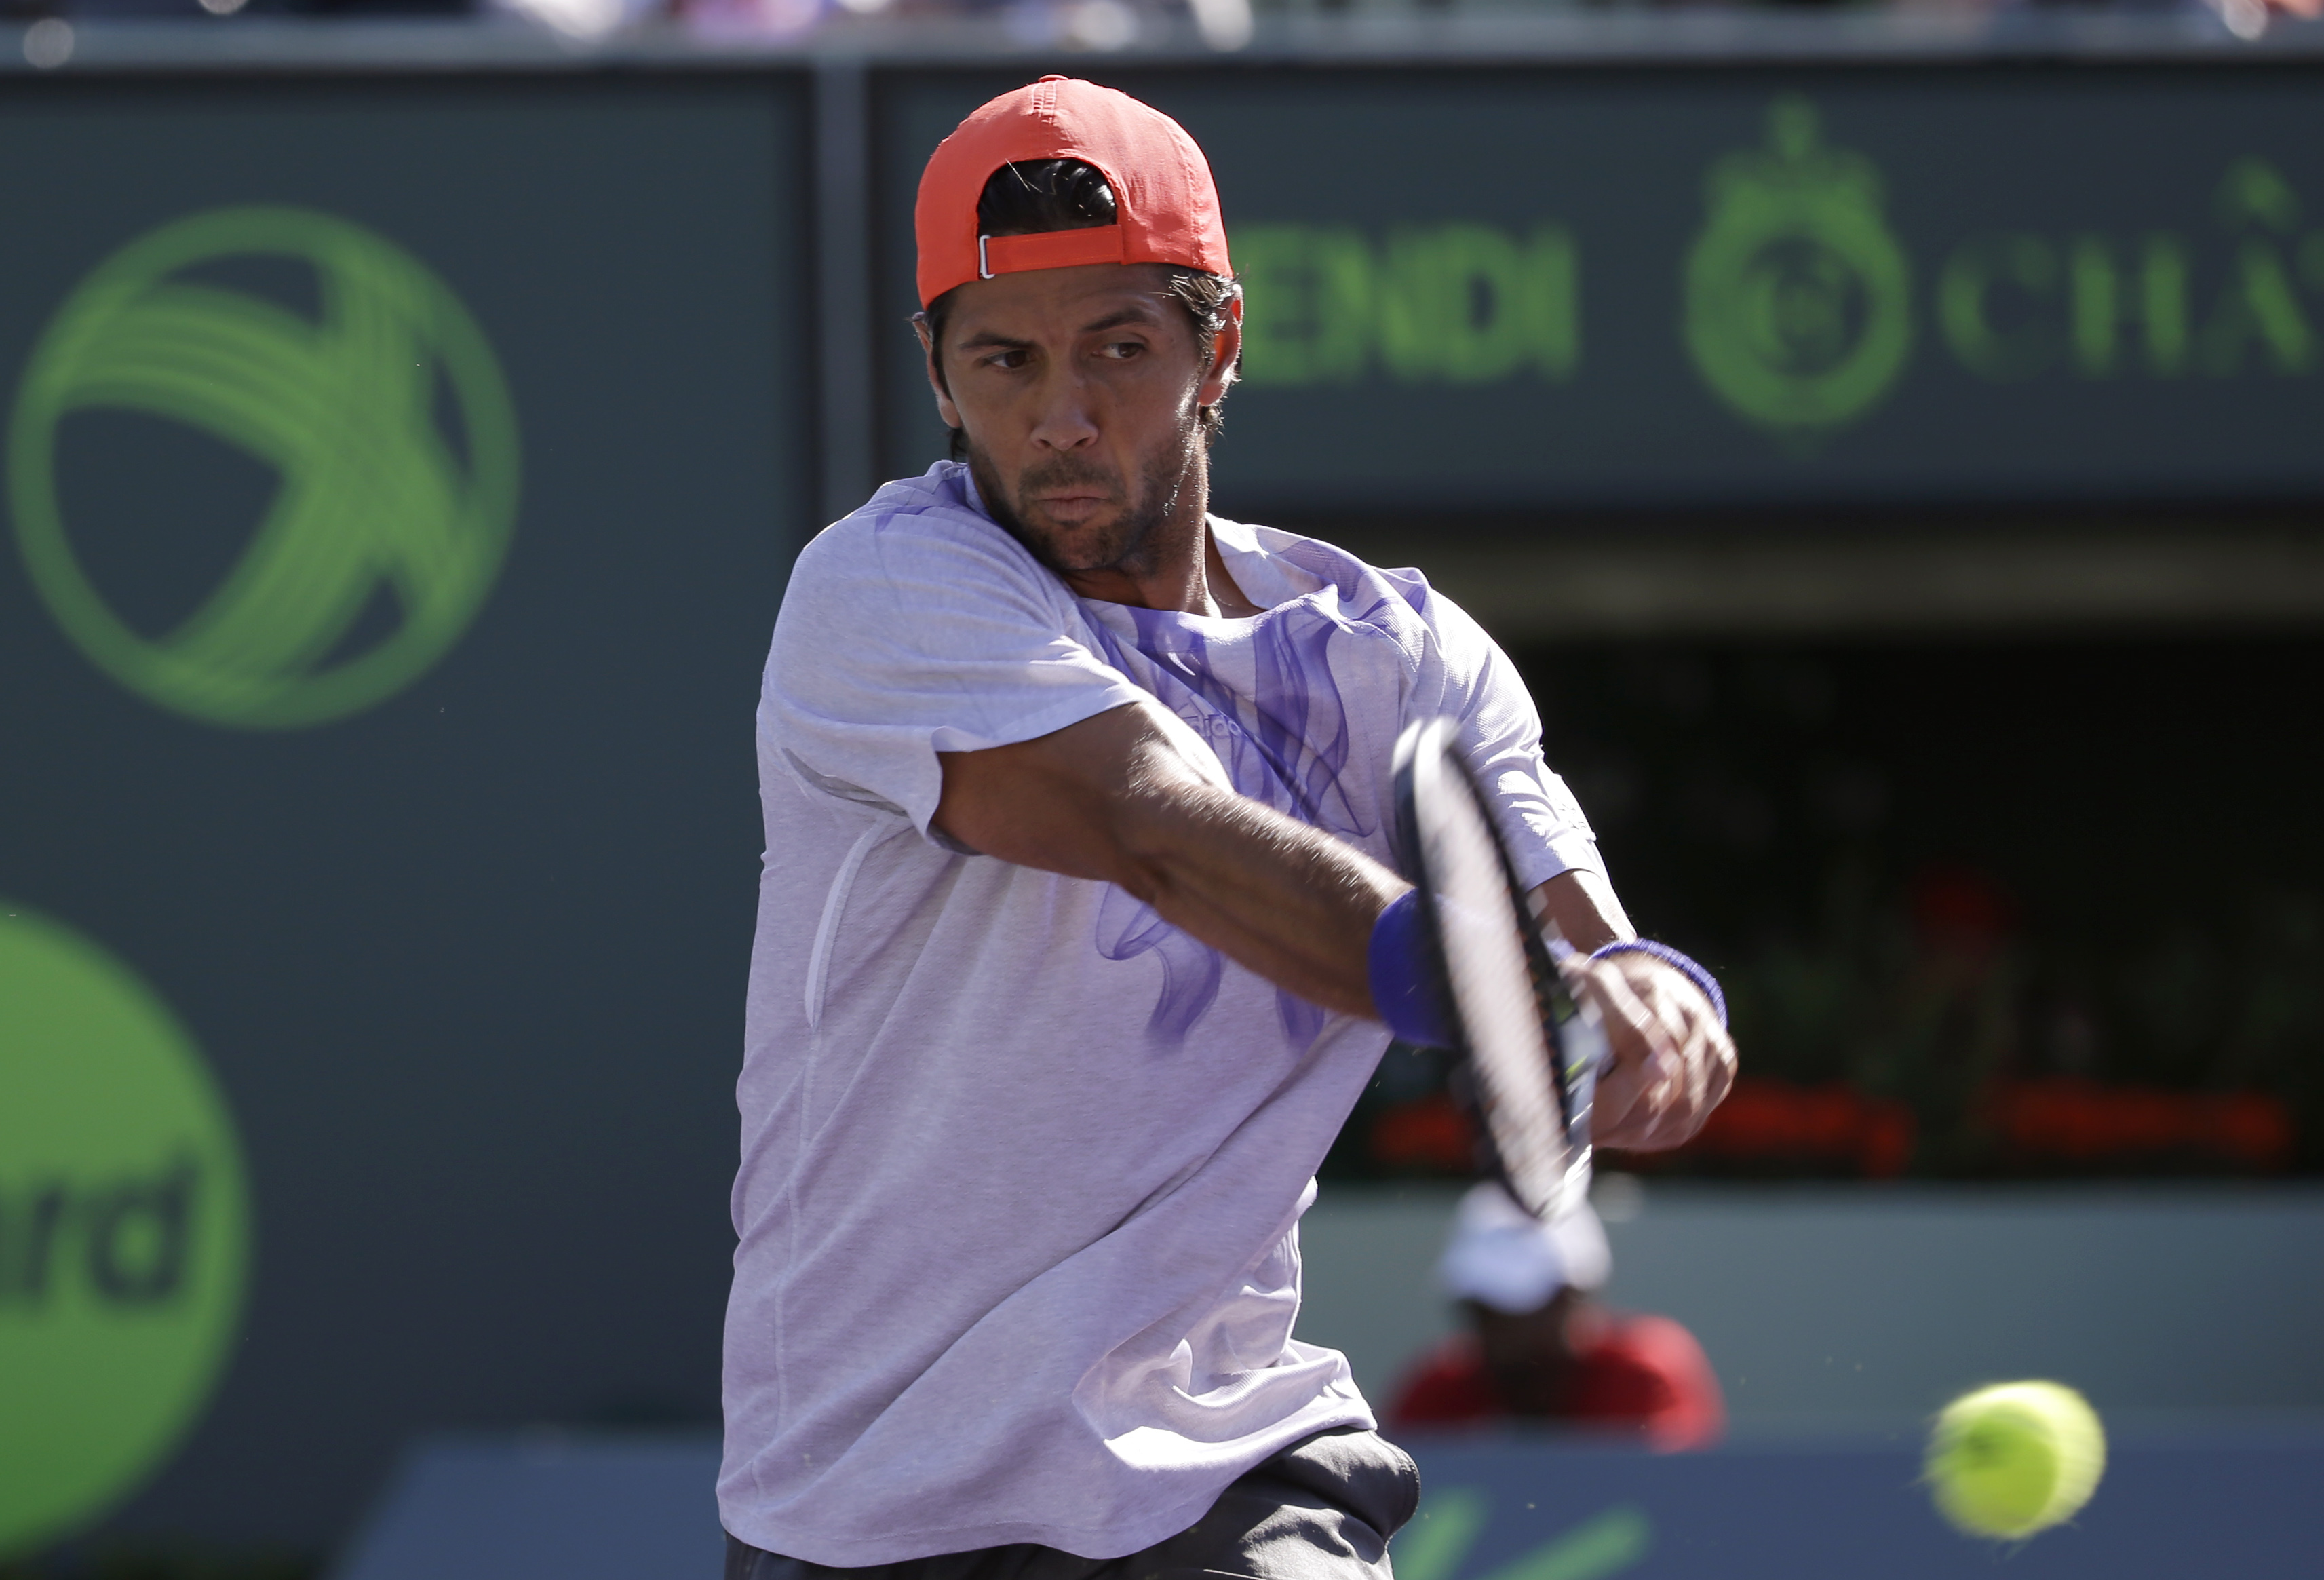 Serena Williams beats 15-year-old at Miami Open; Nadal loses